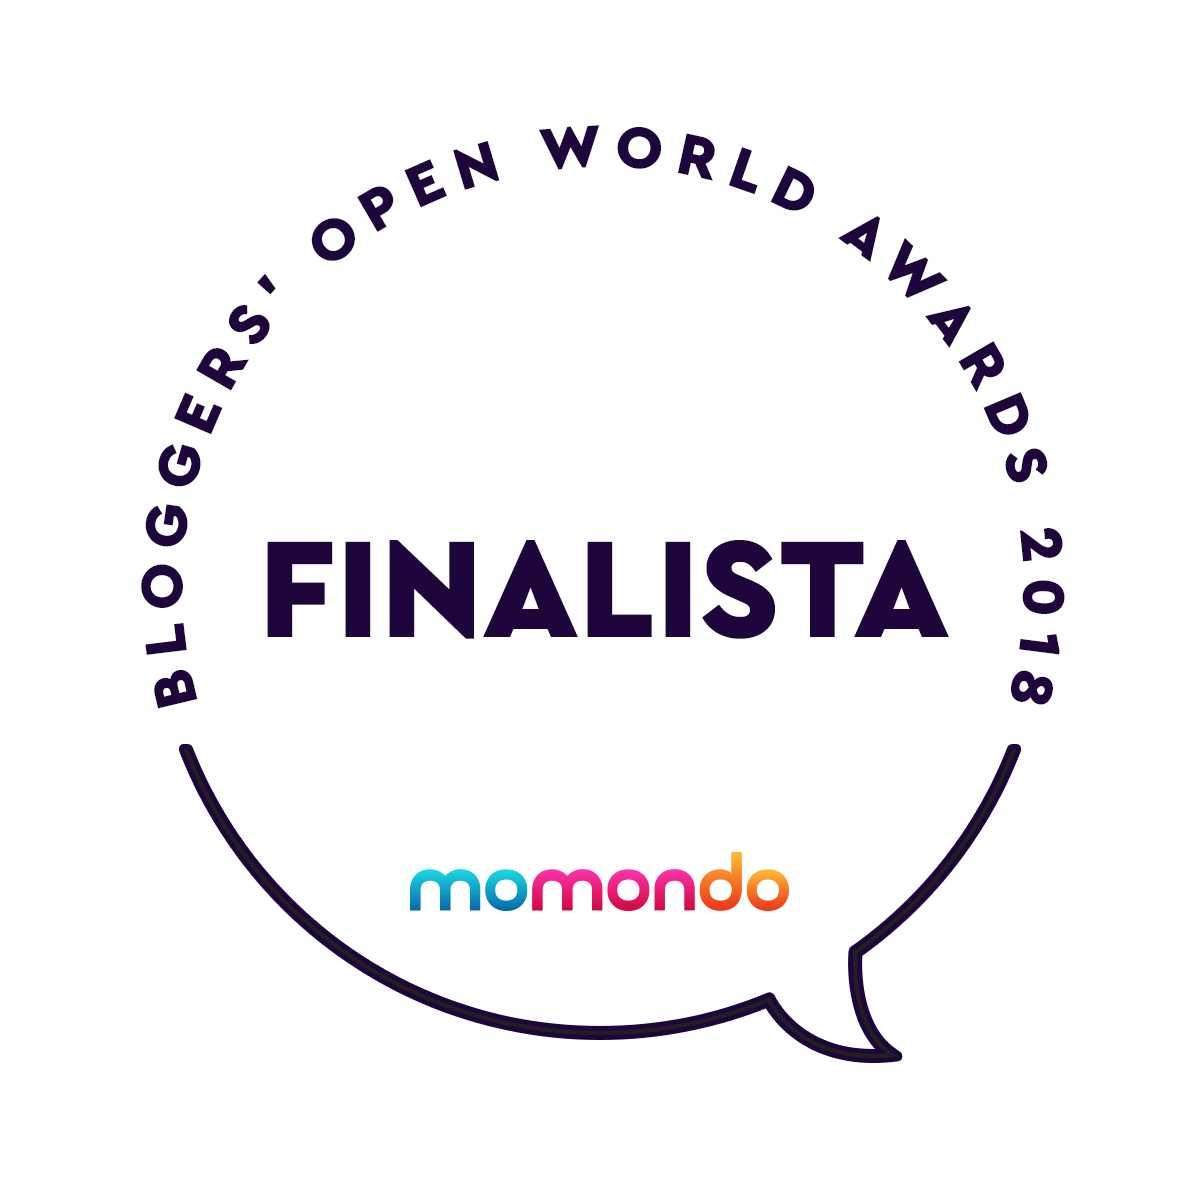 Bloggers Open World Awards 2018 Finalista